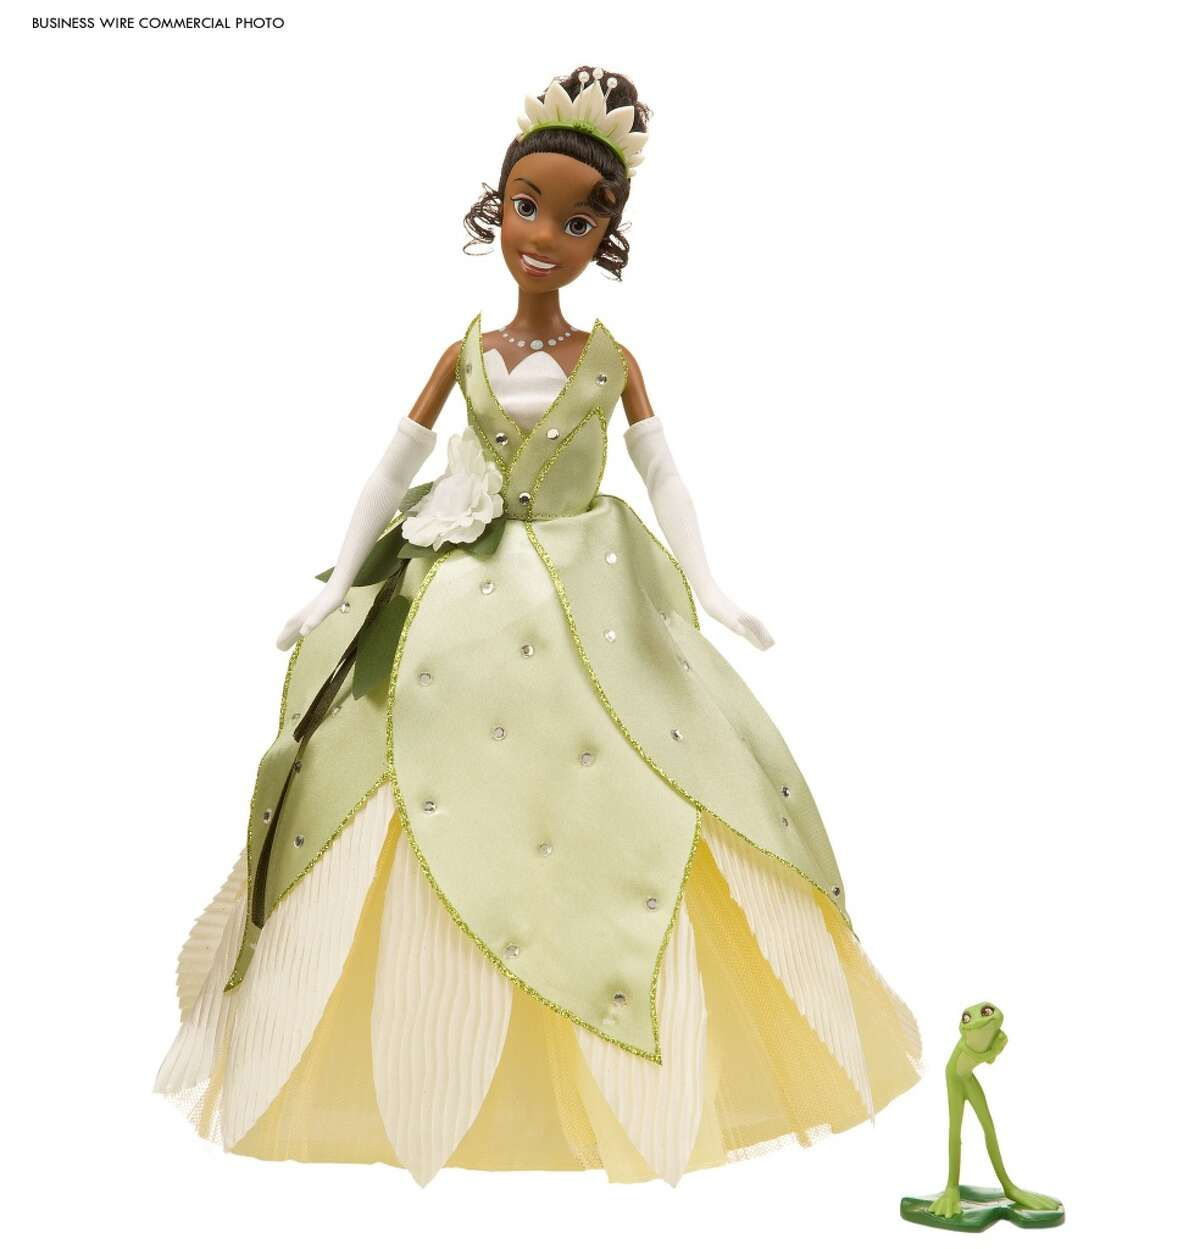 Girls No. 10: Disney dolls